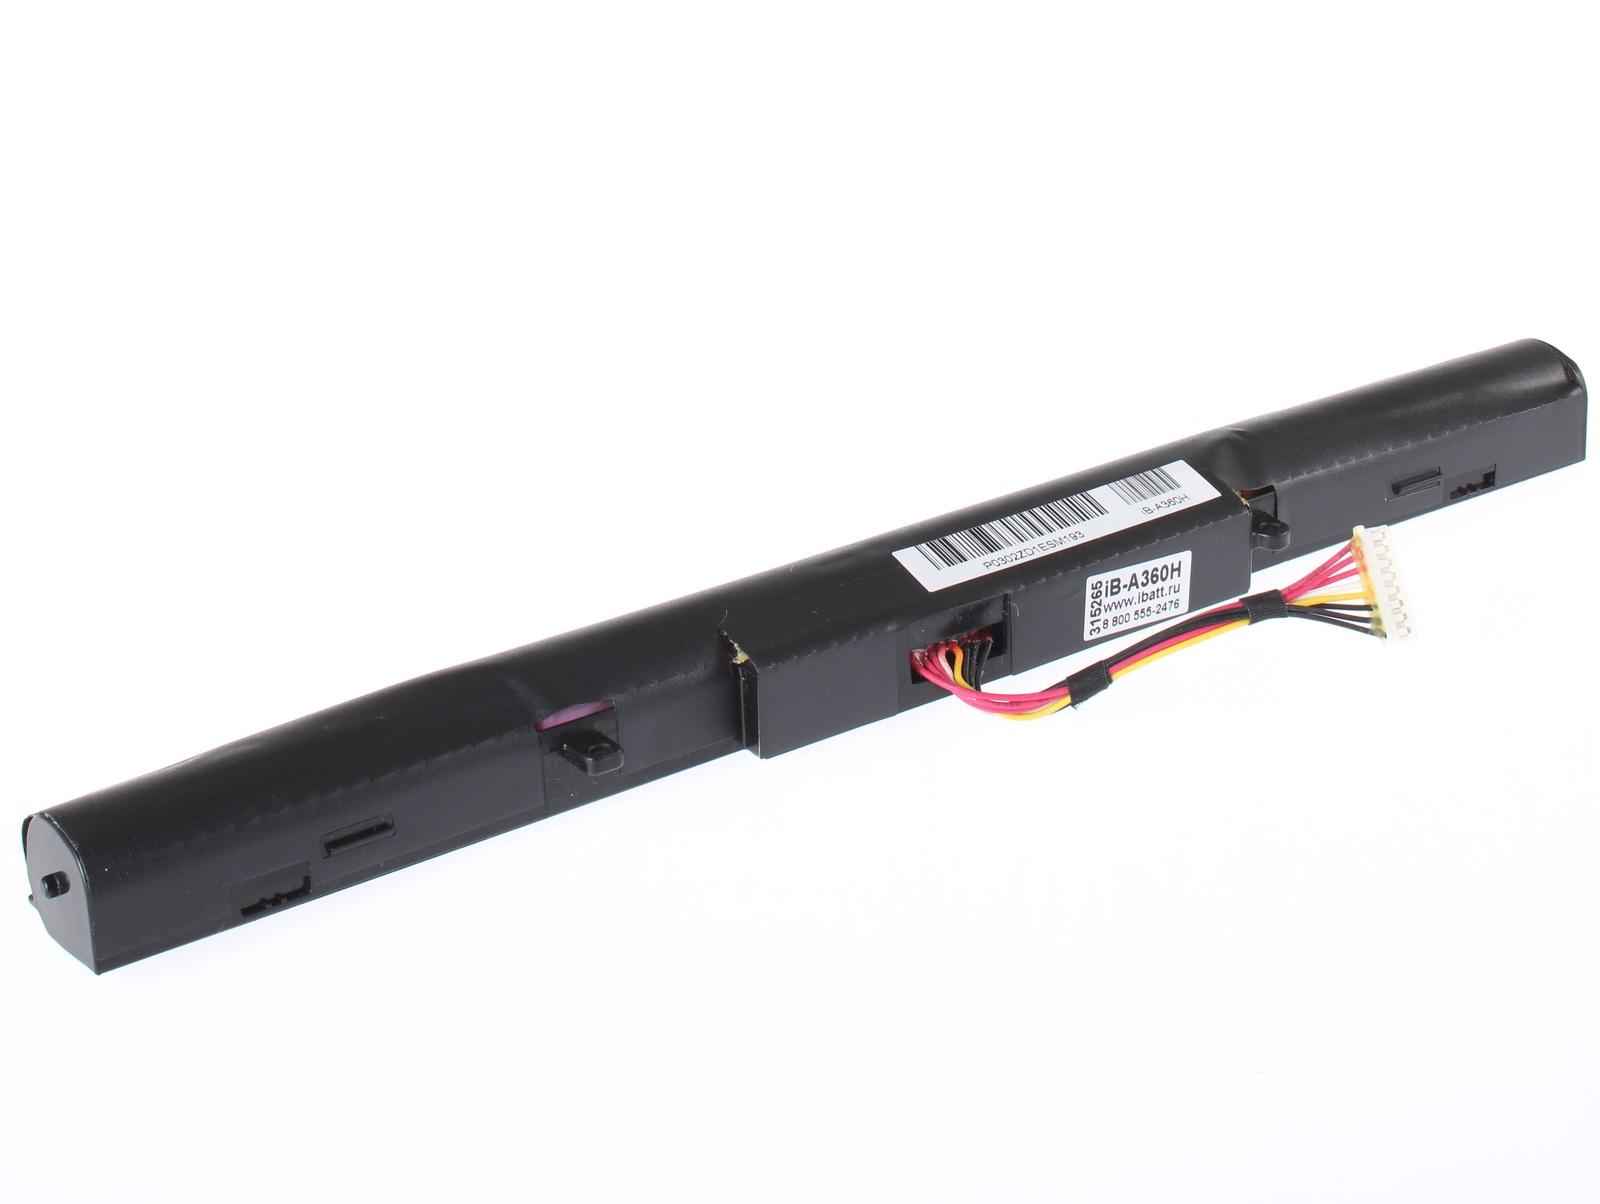 Аккумуляторная батарея iBatt iB-T3-A360H 2600mAh для ноутбуков Asus R513CL, X550JD, R510CC-XO359H, X450LB, X450LN, F550CC, K550JK, X552V, X450J, X550JK-XO072H, X550JK-XO031H, R510JX, X450JF, X550VL, A550CC, X450CA, X450V, X550CC 90NB00W2-M01970, K550CA, asus x550cc